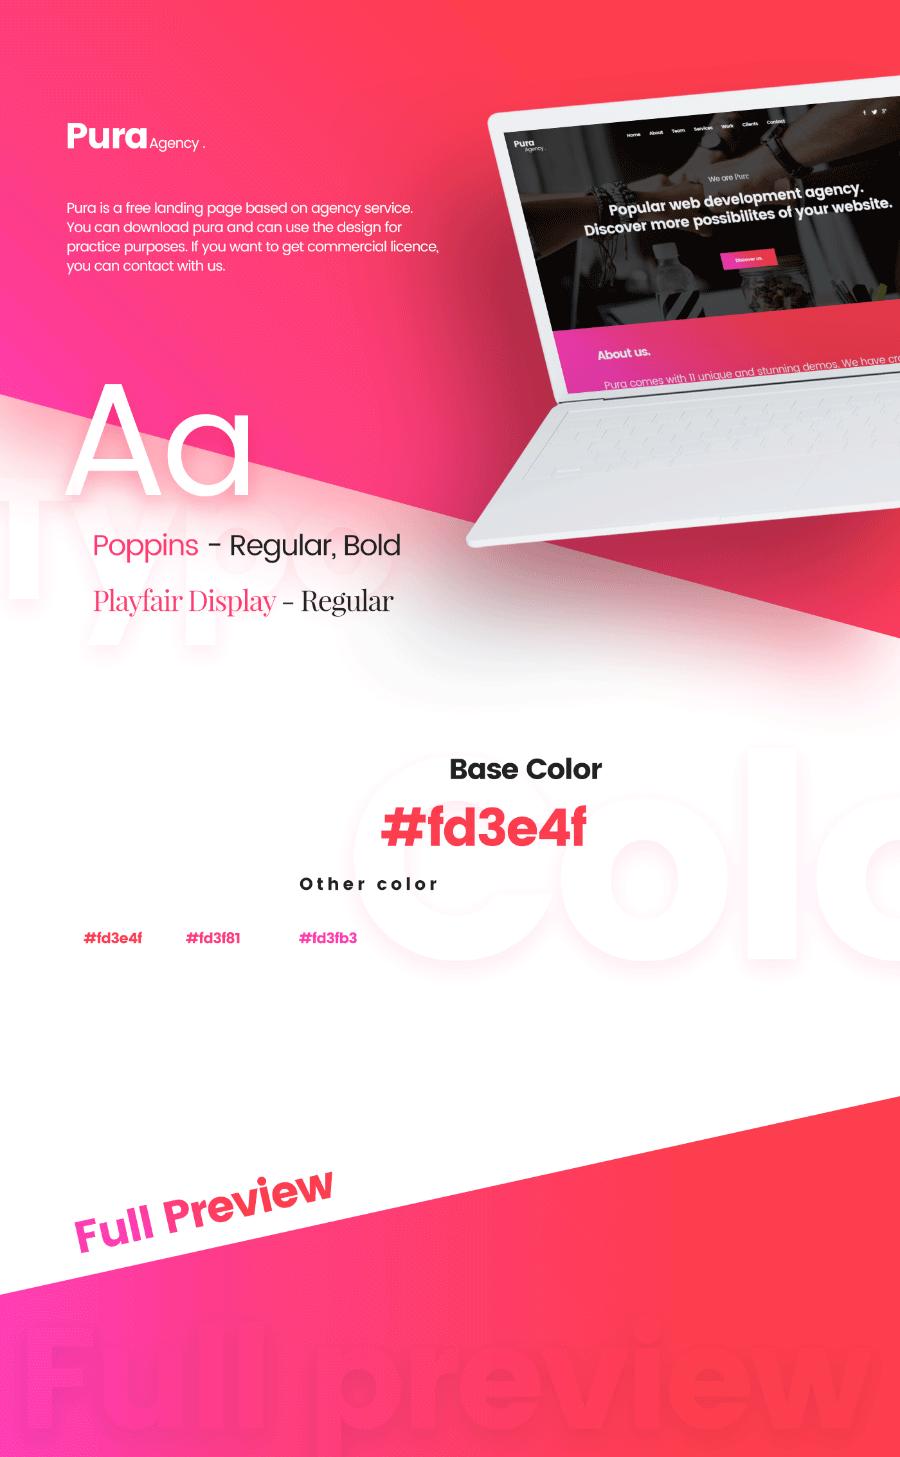 Pura 무료 홈페이지 디자인 템플릿 Free PSD Landing Page